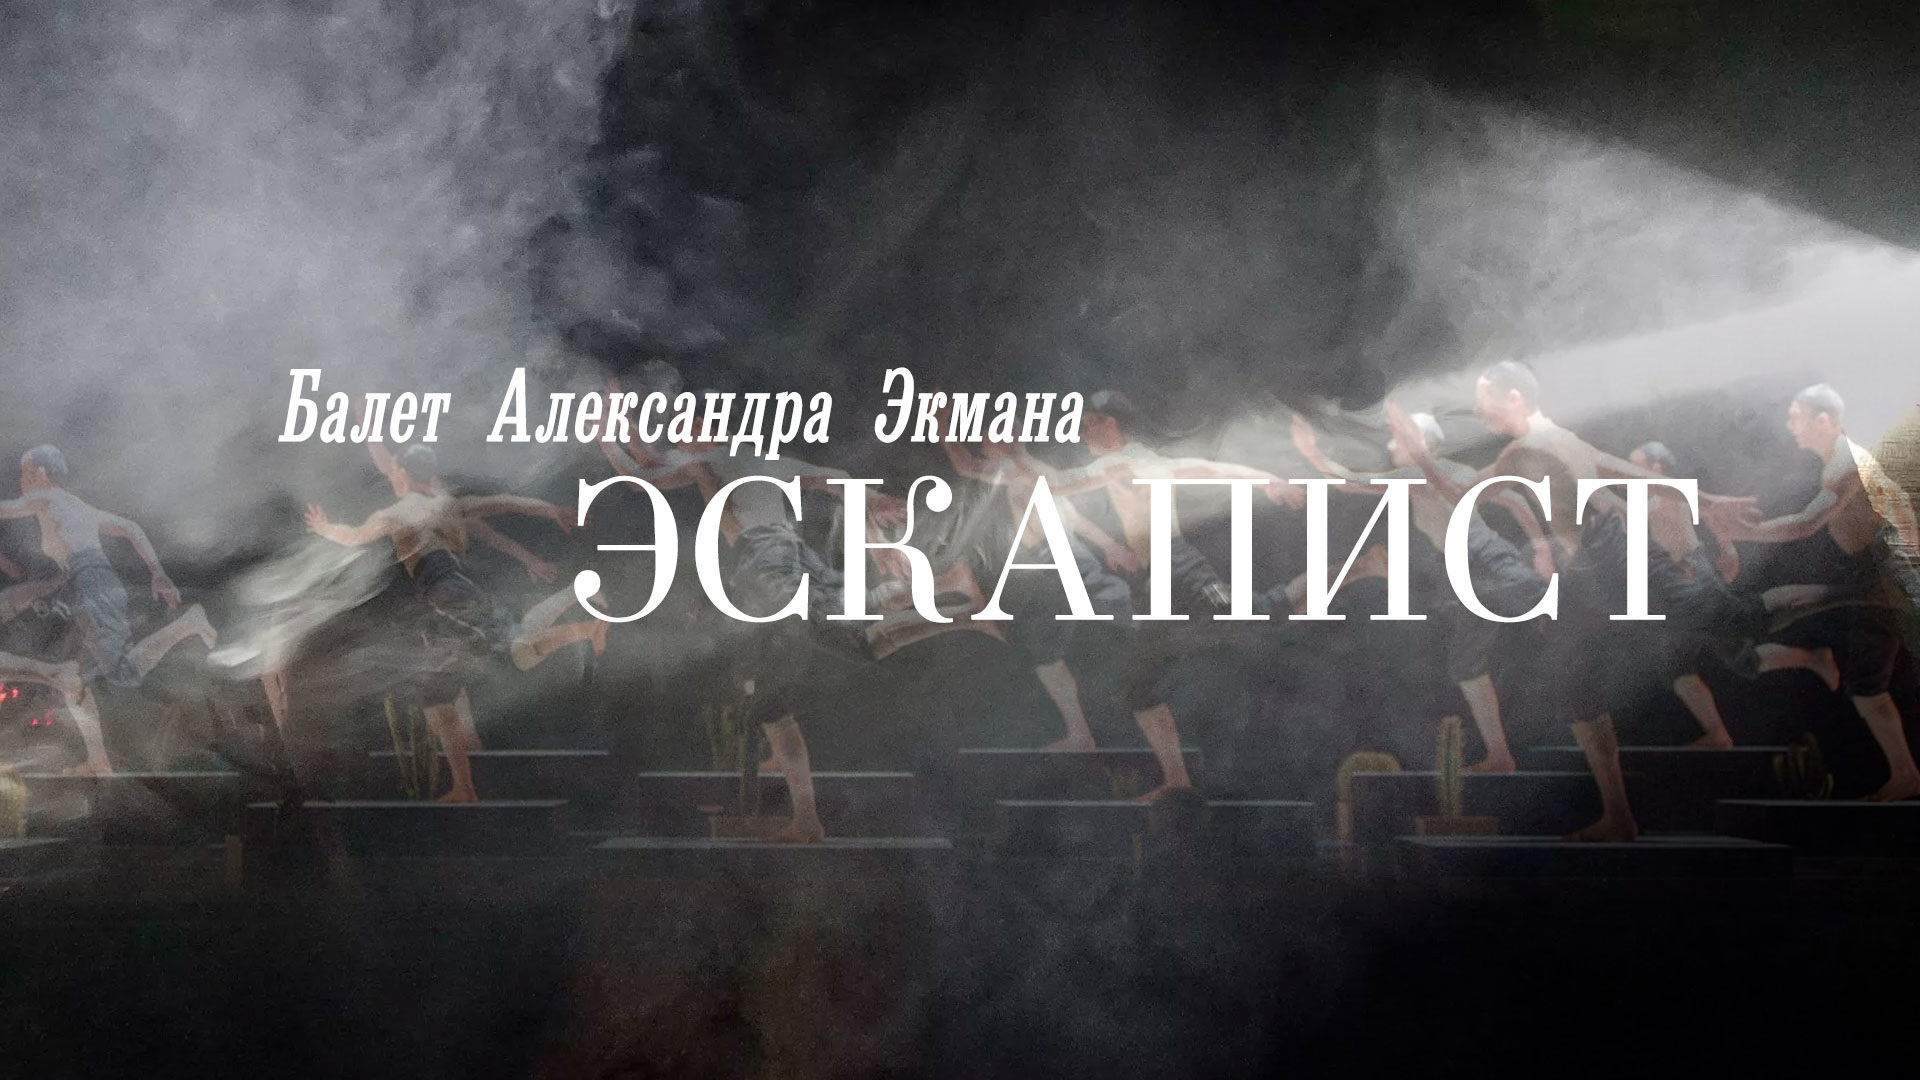 Эскапист. Балет Александра Экмана